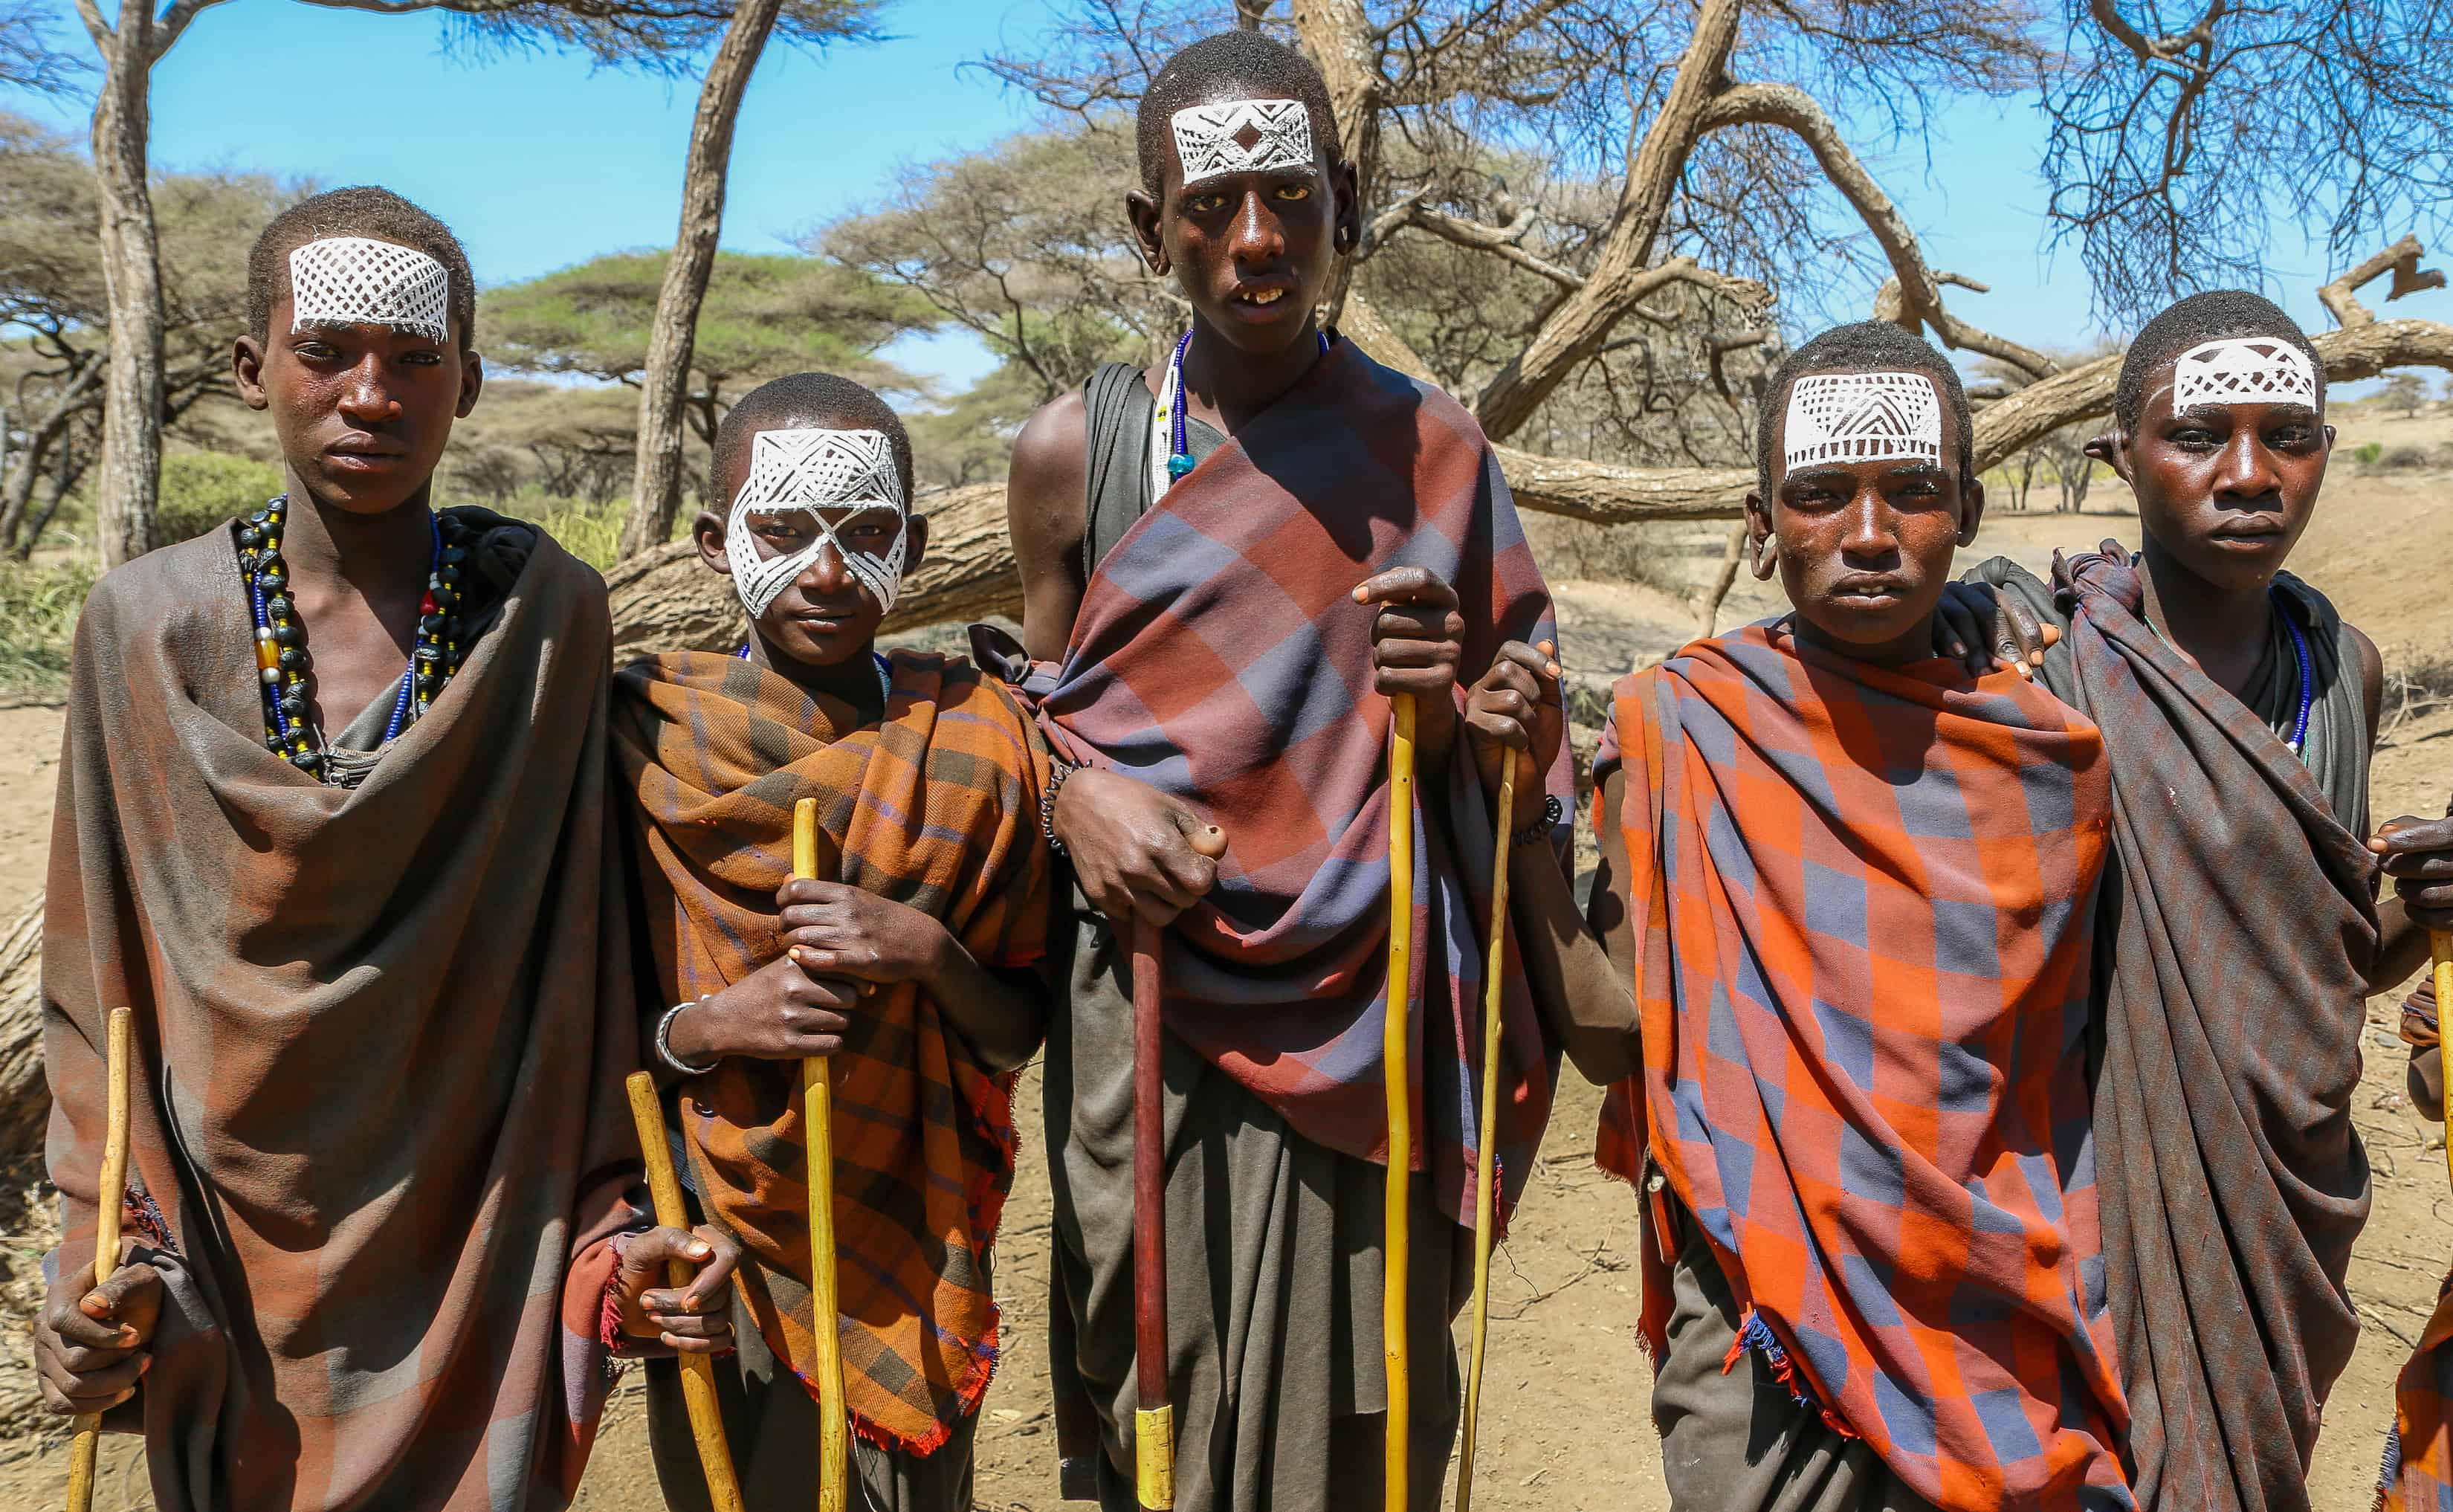 Maasai Boys, a.k.a. Moran